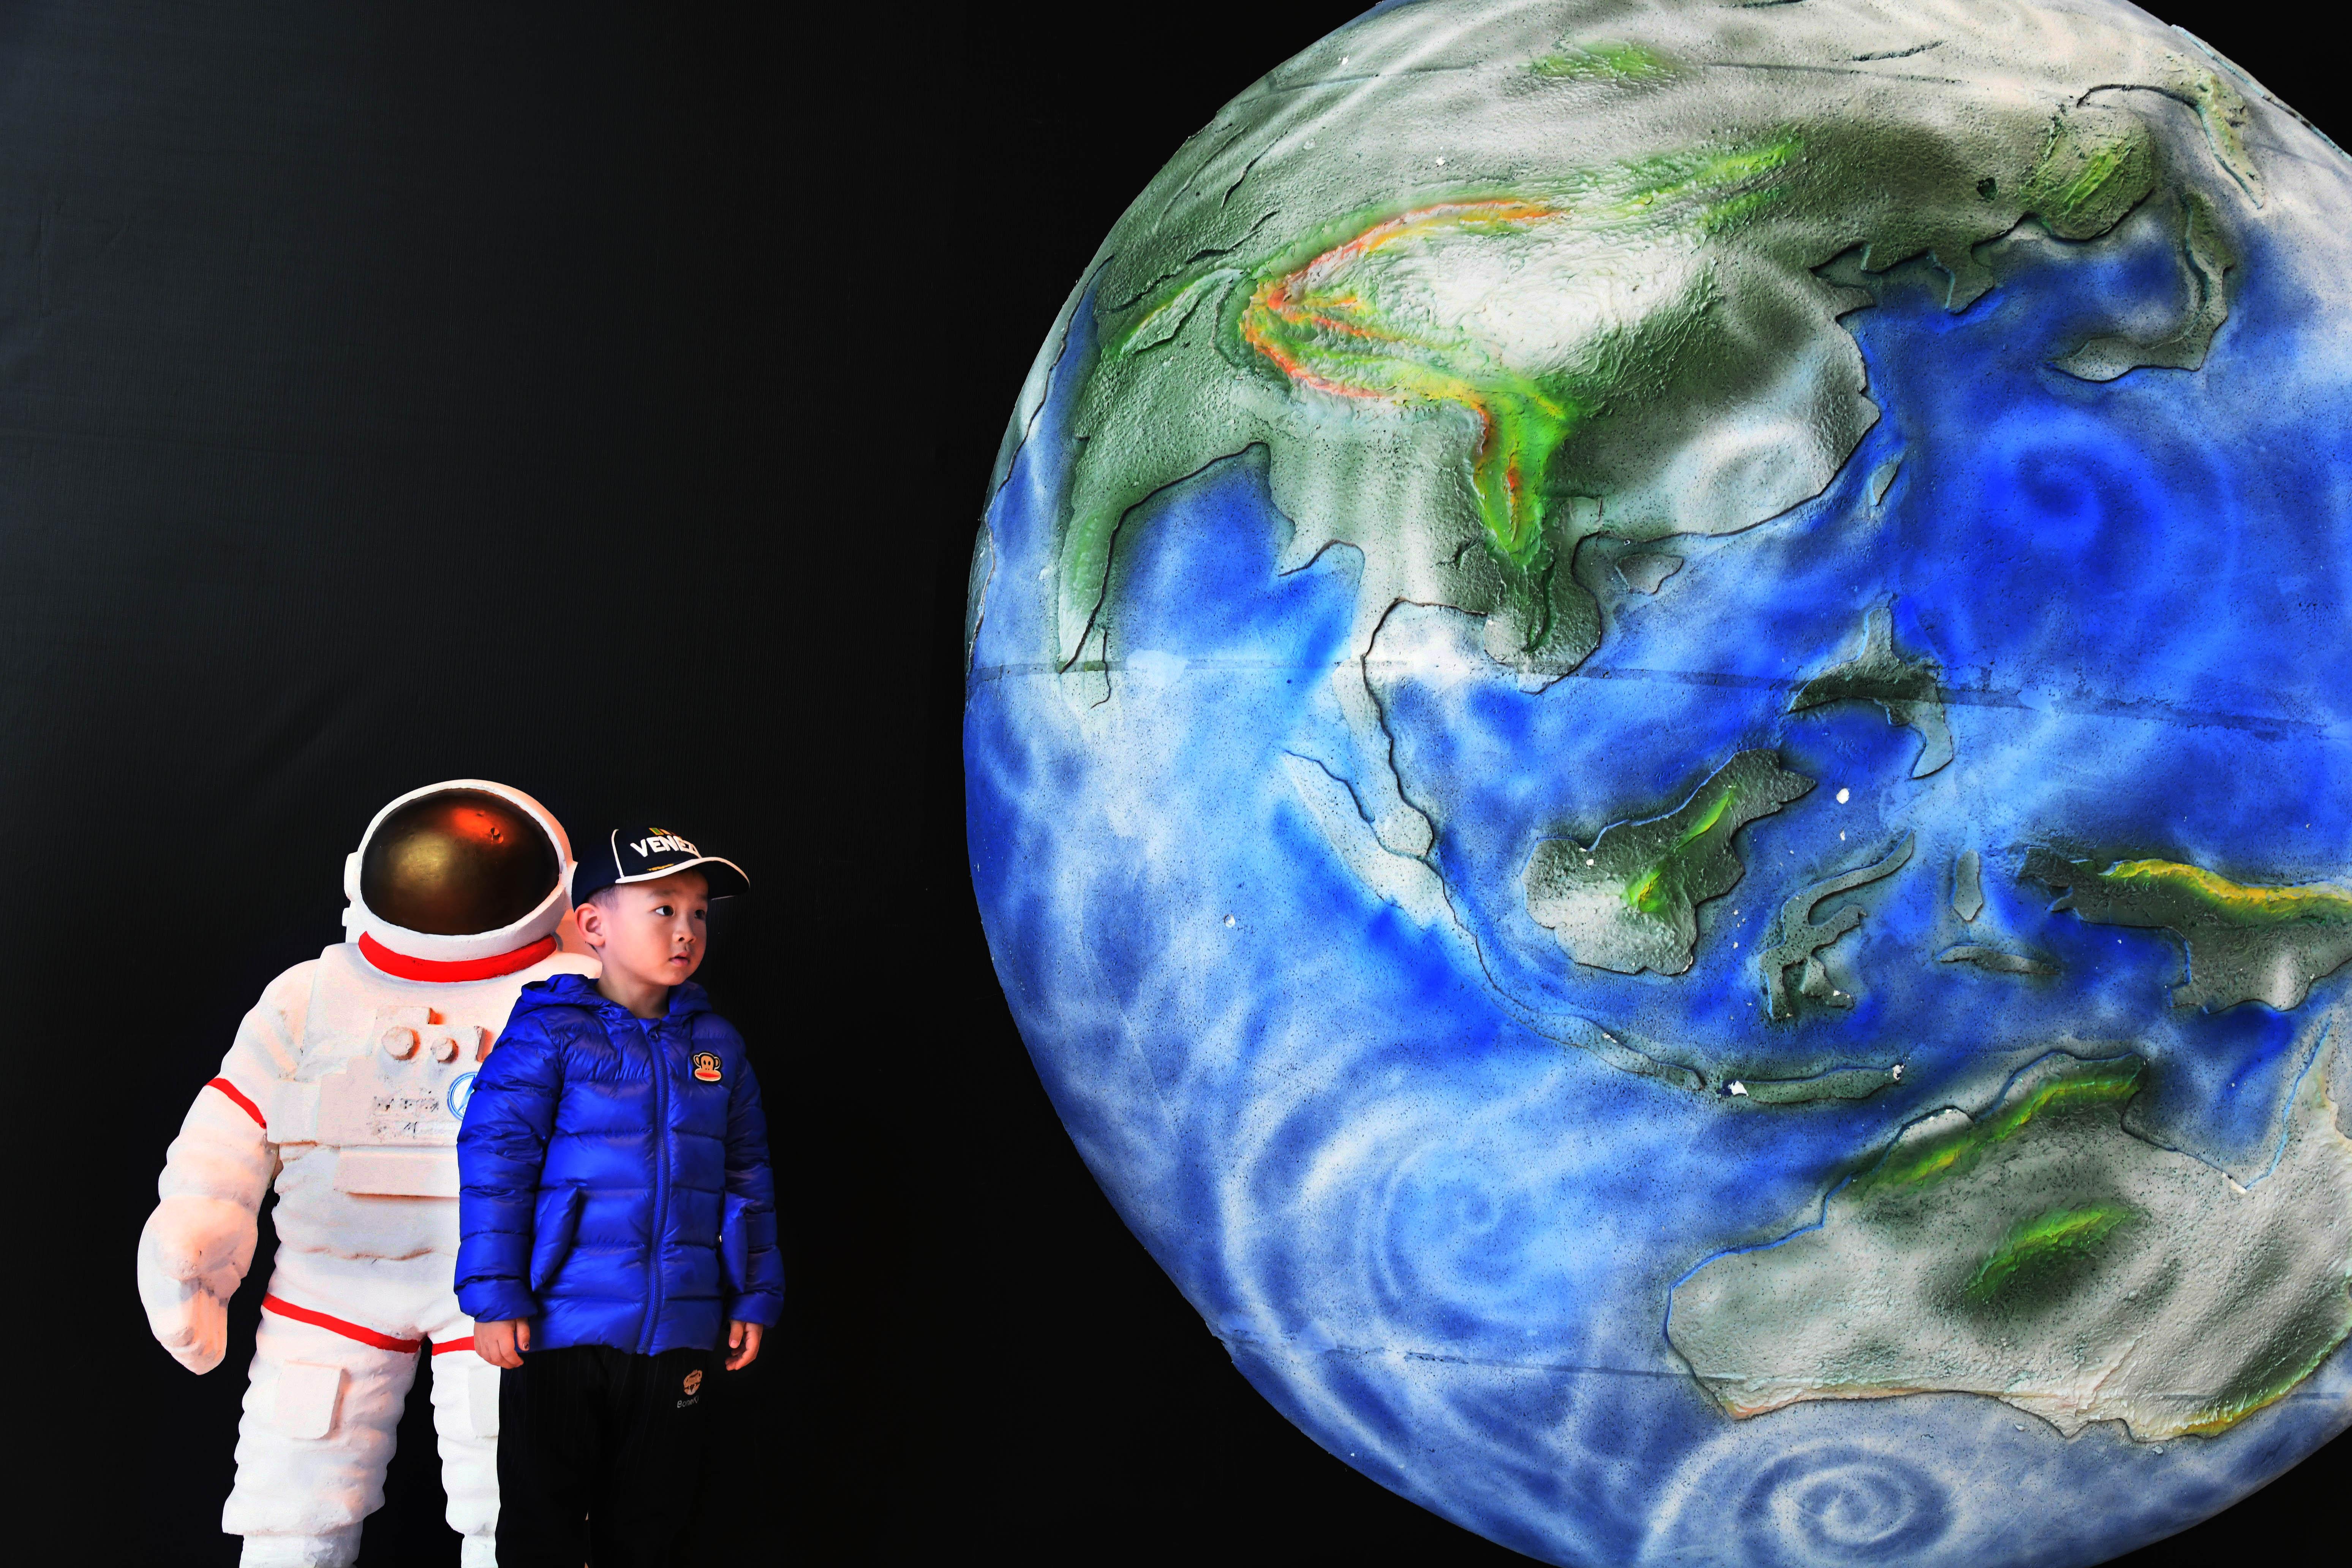 Multimedia) China Focus: Sci-fi genre to inspire next